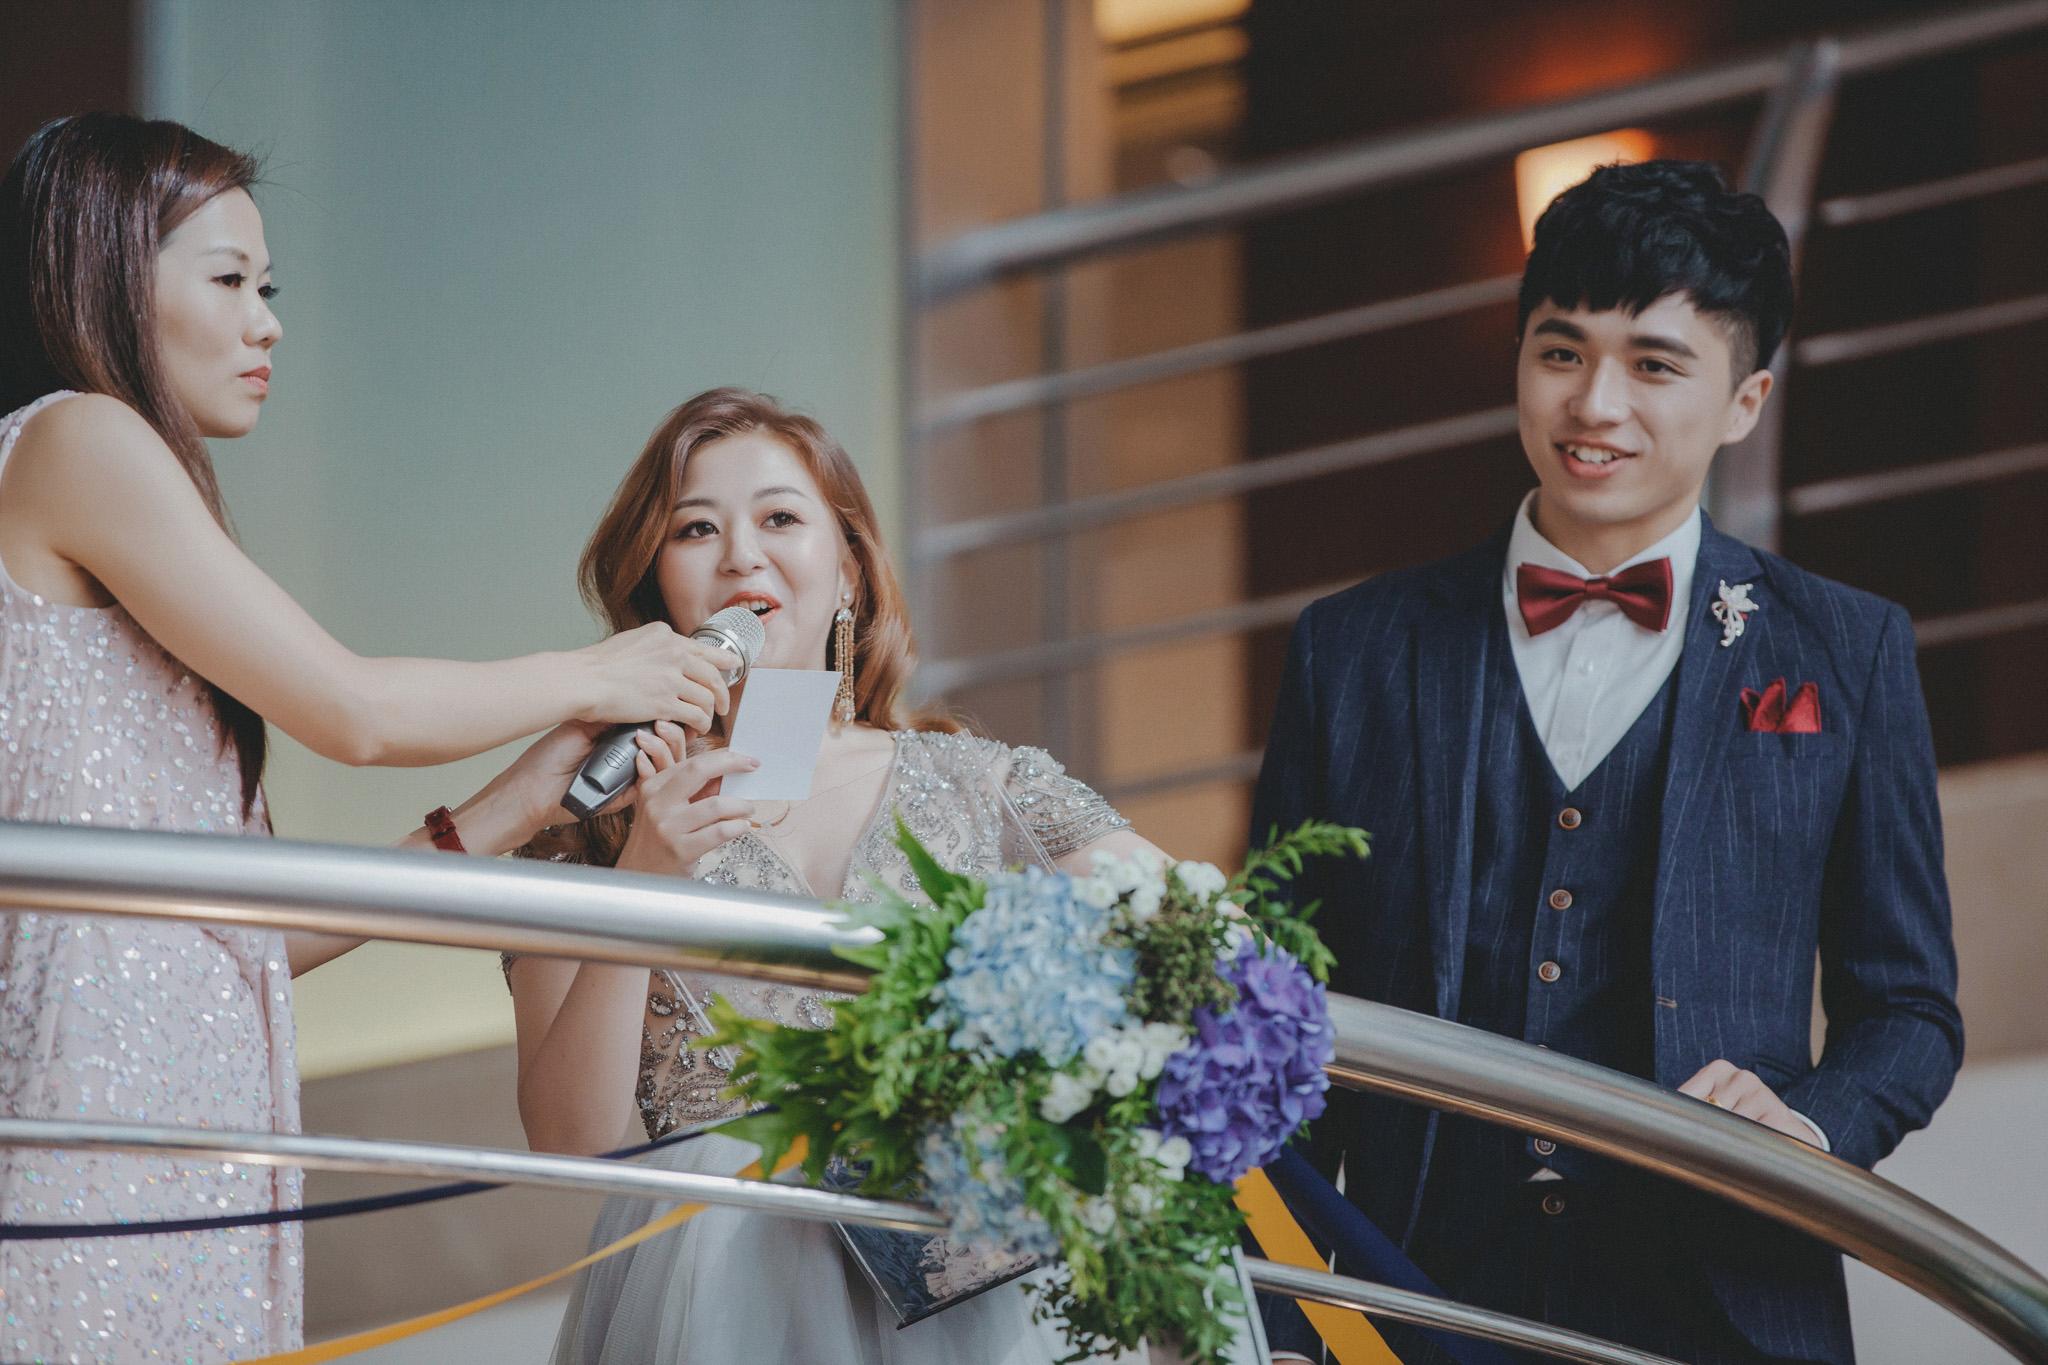 Easternwedding EW JMH 婚禮 婚攝 居米 新竹 國賓